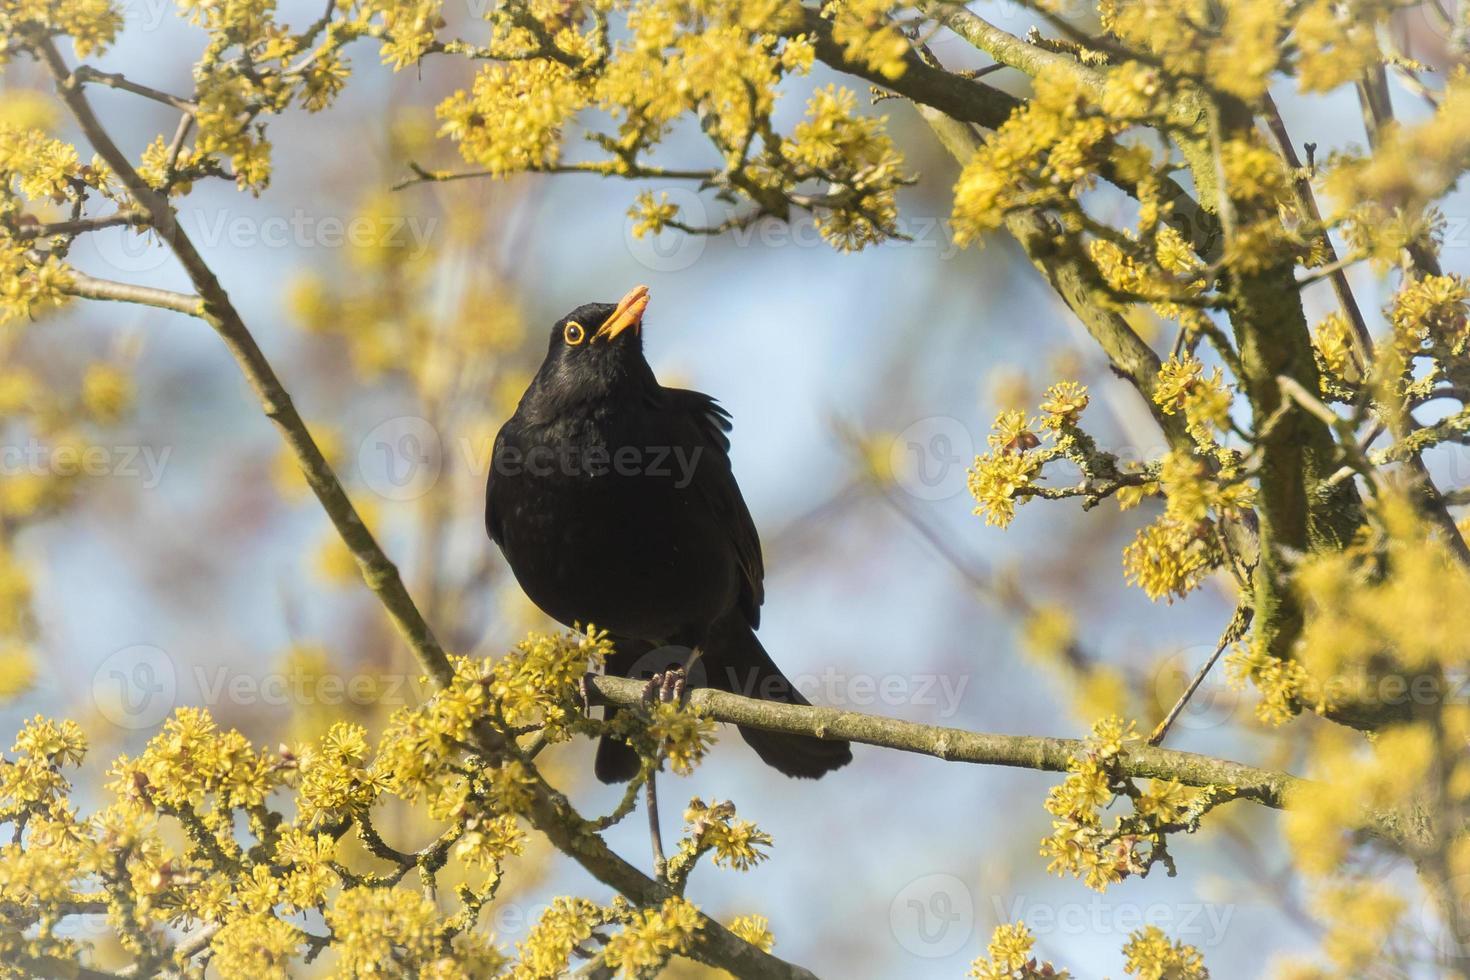 blackbird (turdus merula) sjunger i ett träd foto